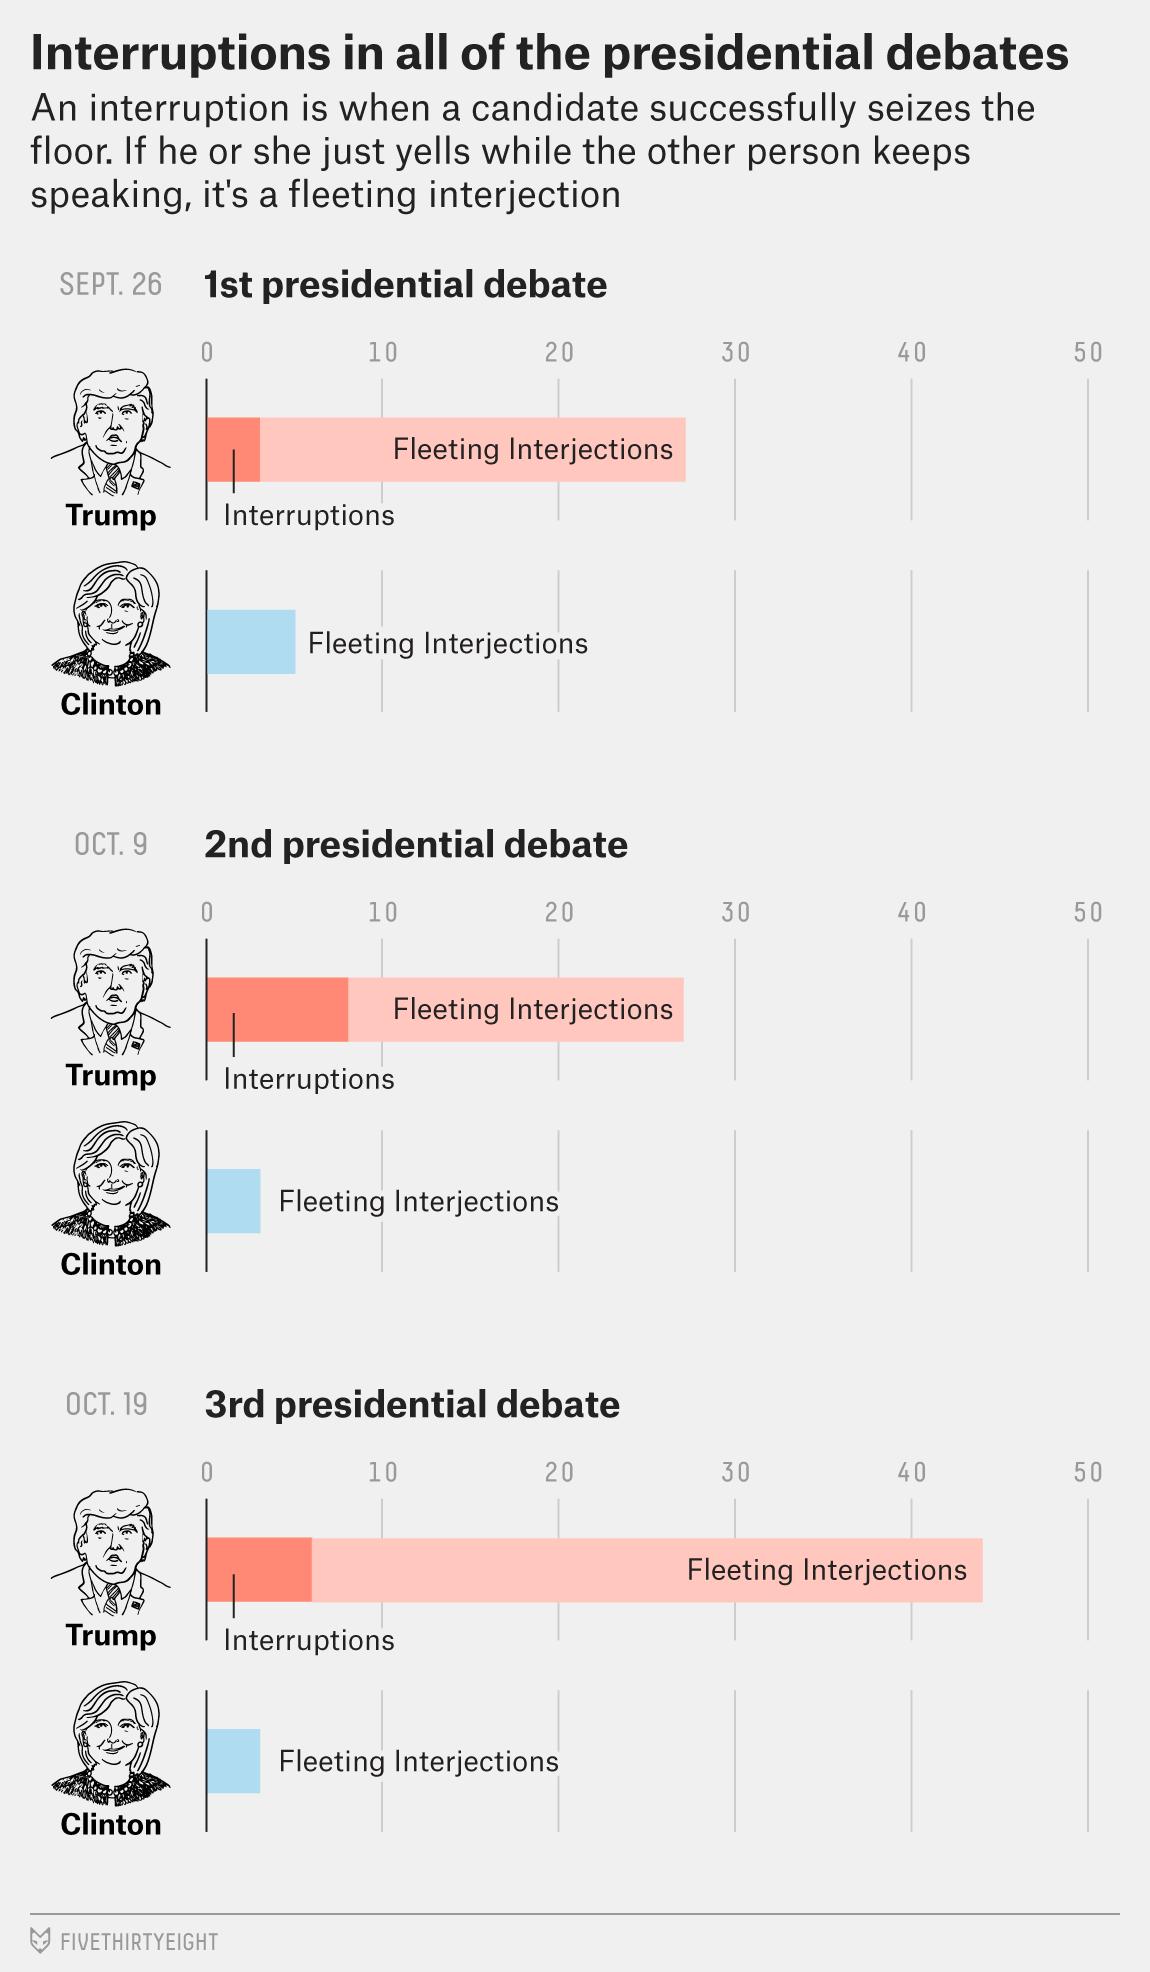 Interruptions at all three debates